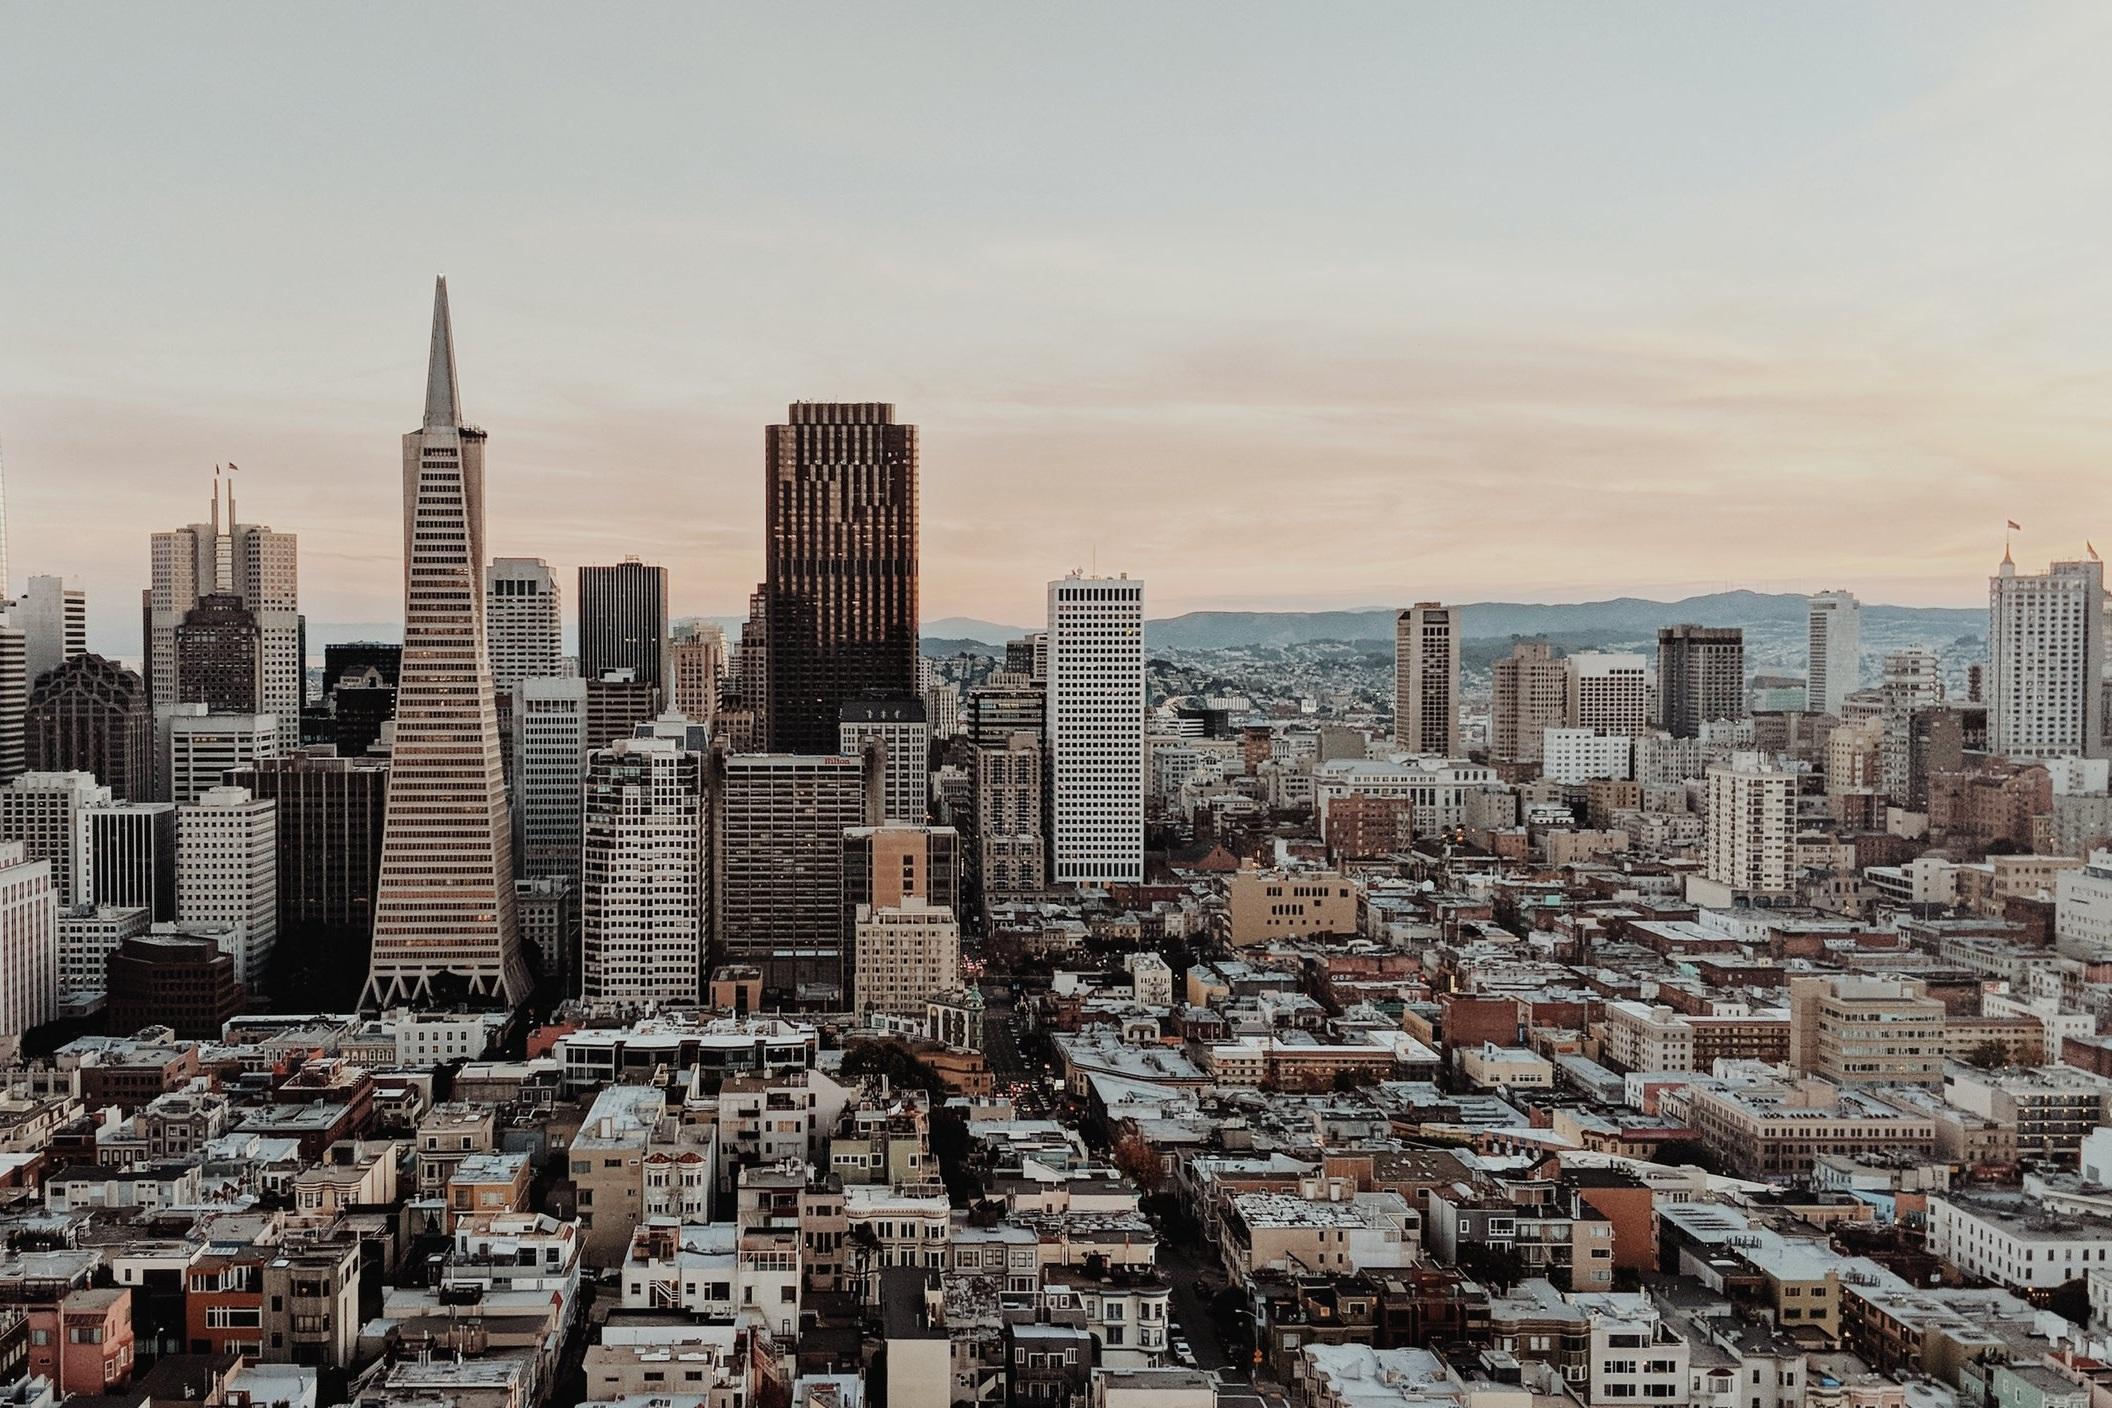 SAN FRANCISCO - CITY GUIDE